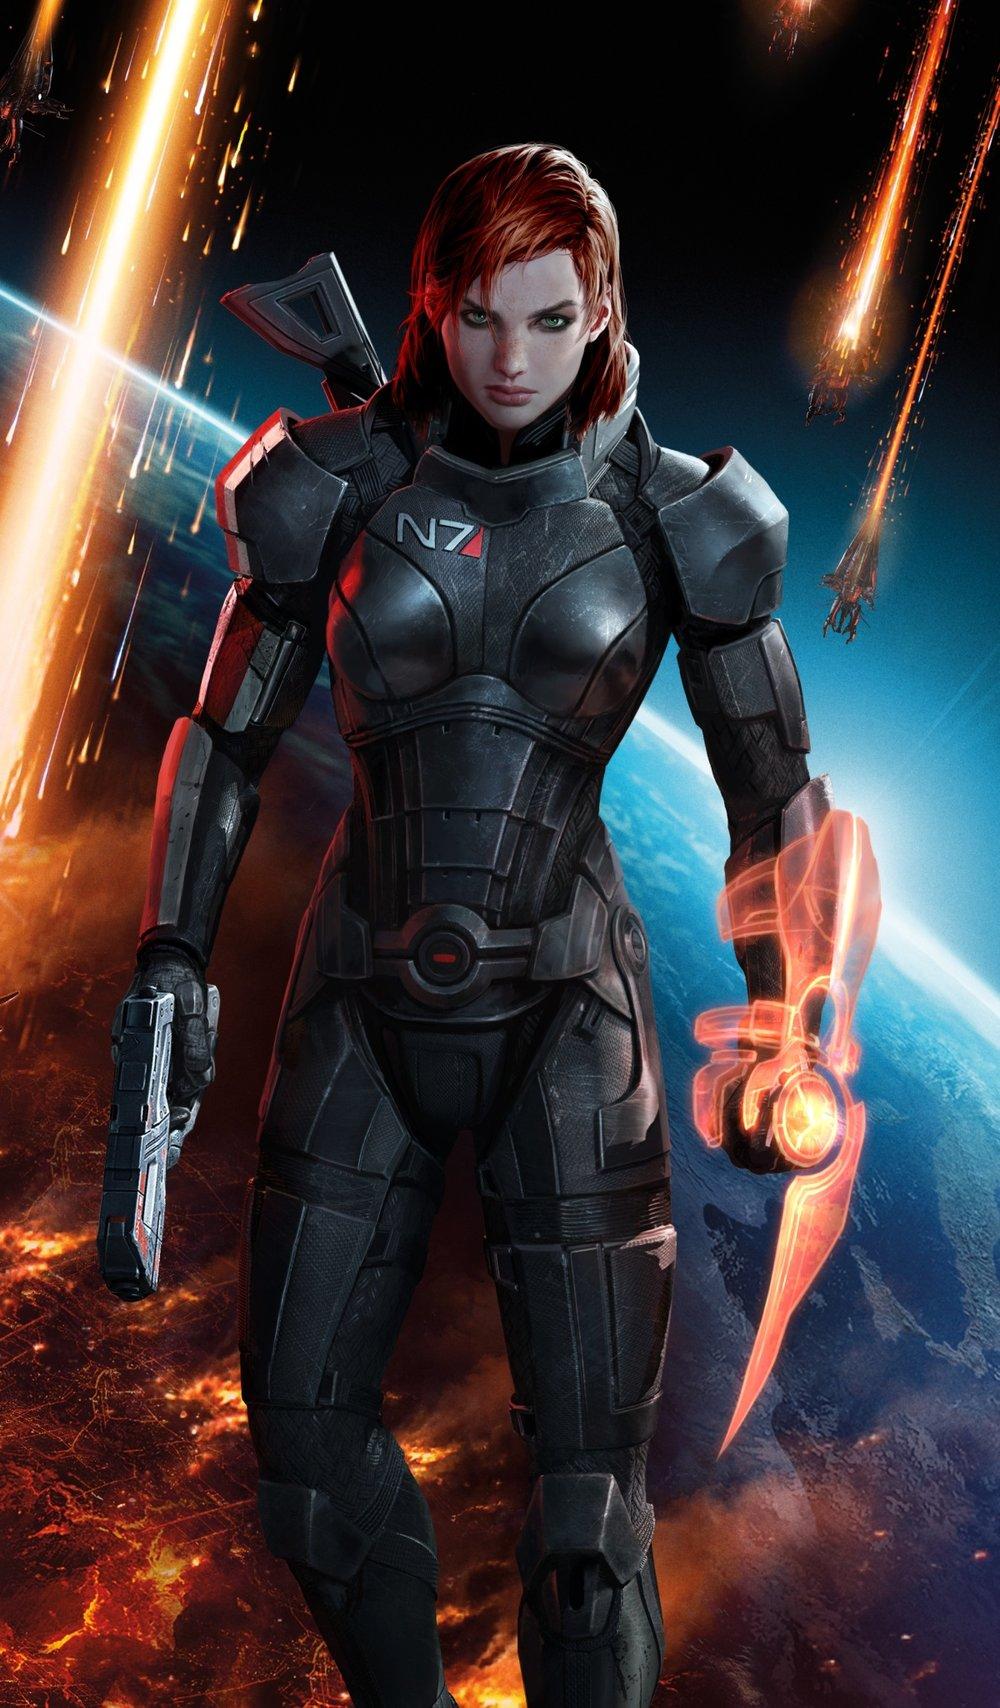 Mass-Effect-3-the-real-female-shepard.jpg